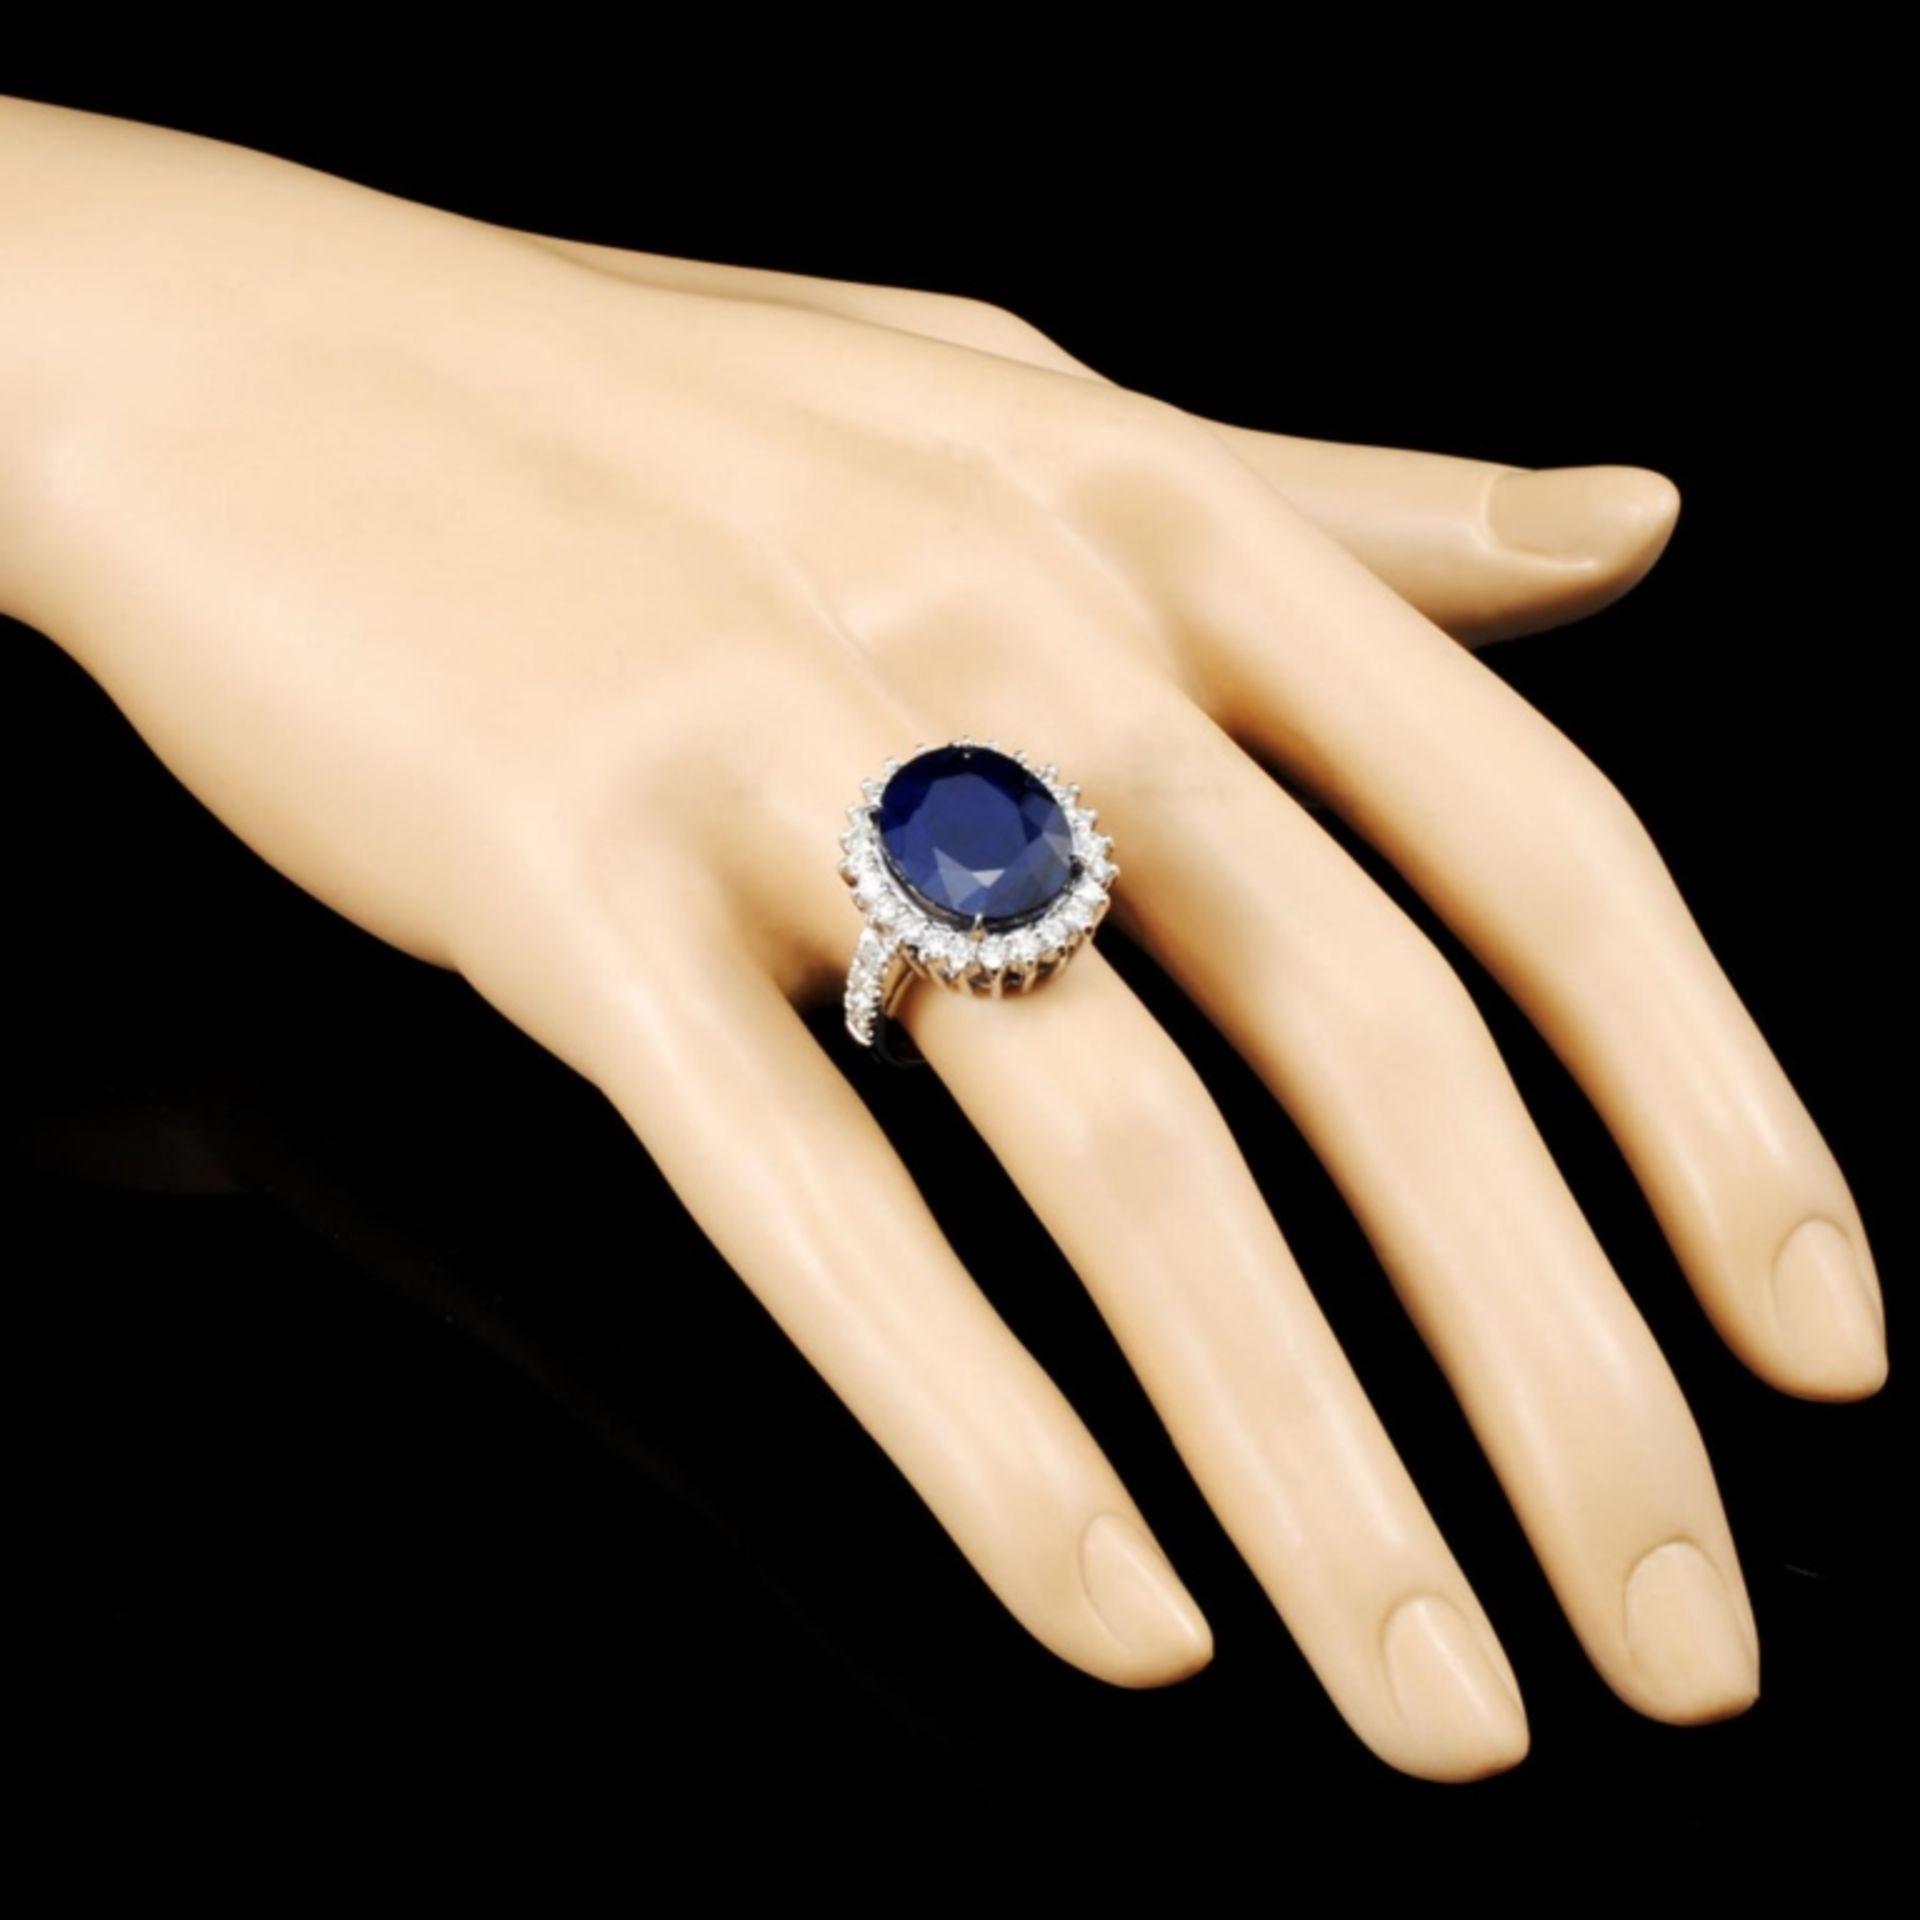 14K Gold 11.90ct Sapphire & 1.24ctw Diamond Ring - Image 3 of 5